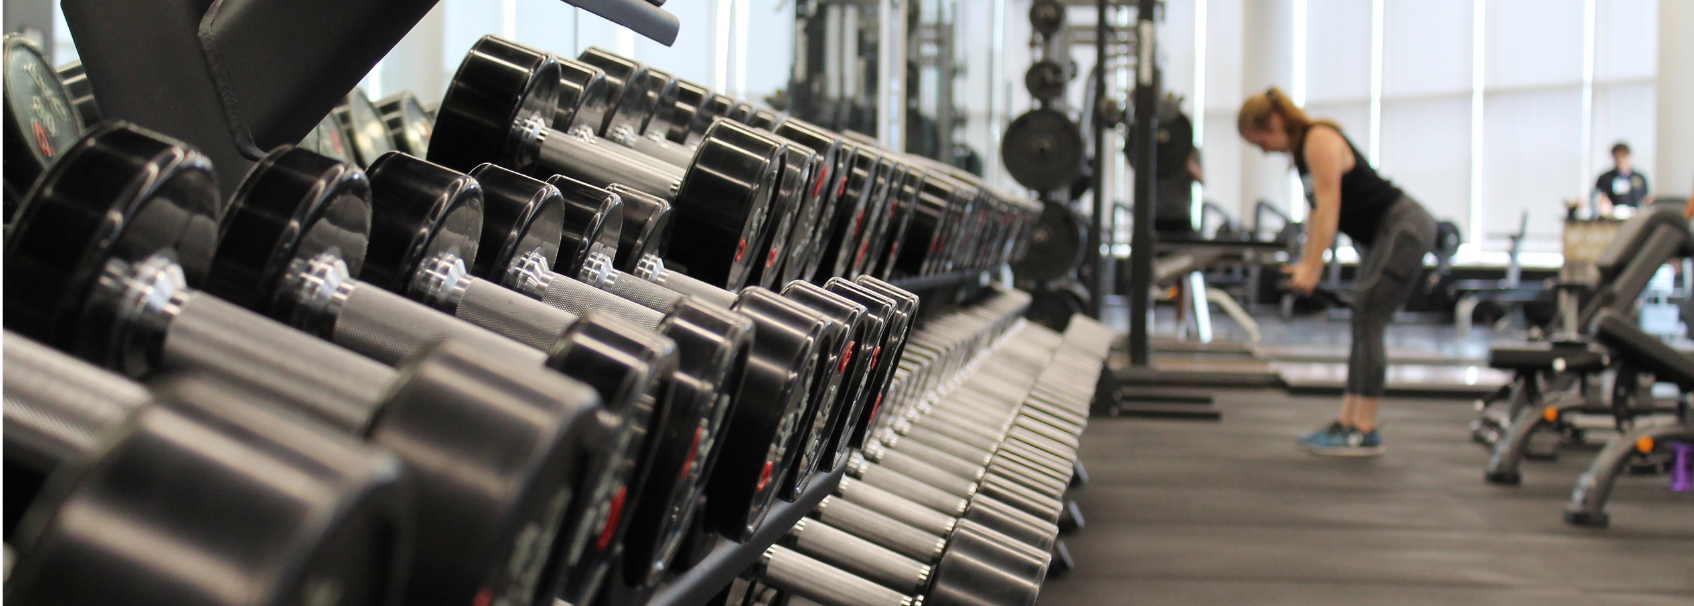 Gym blog 1